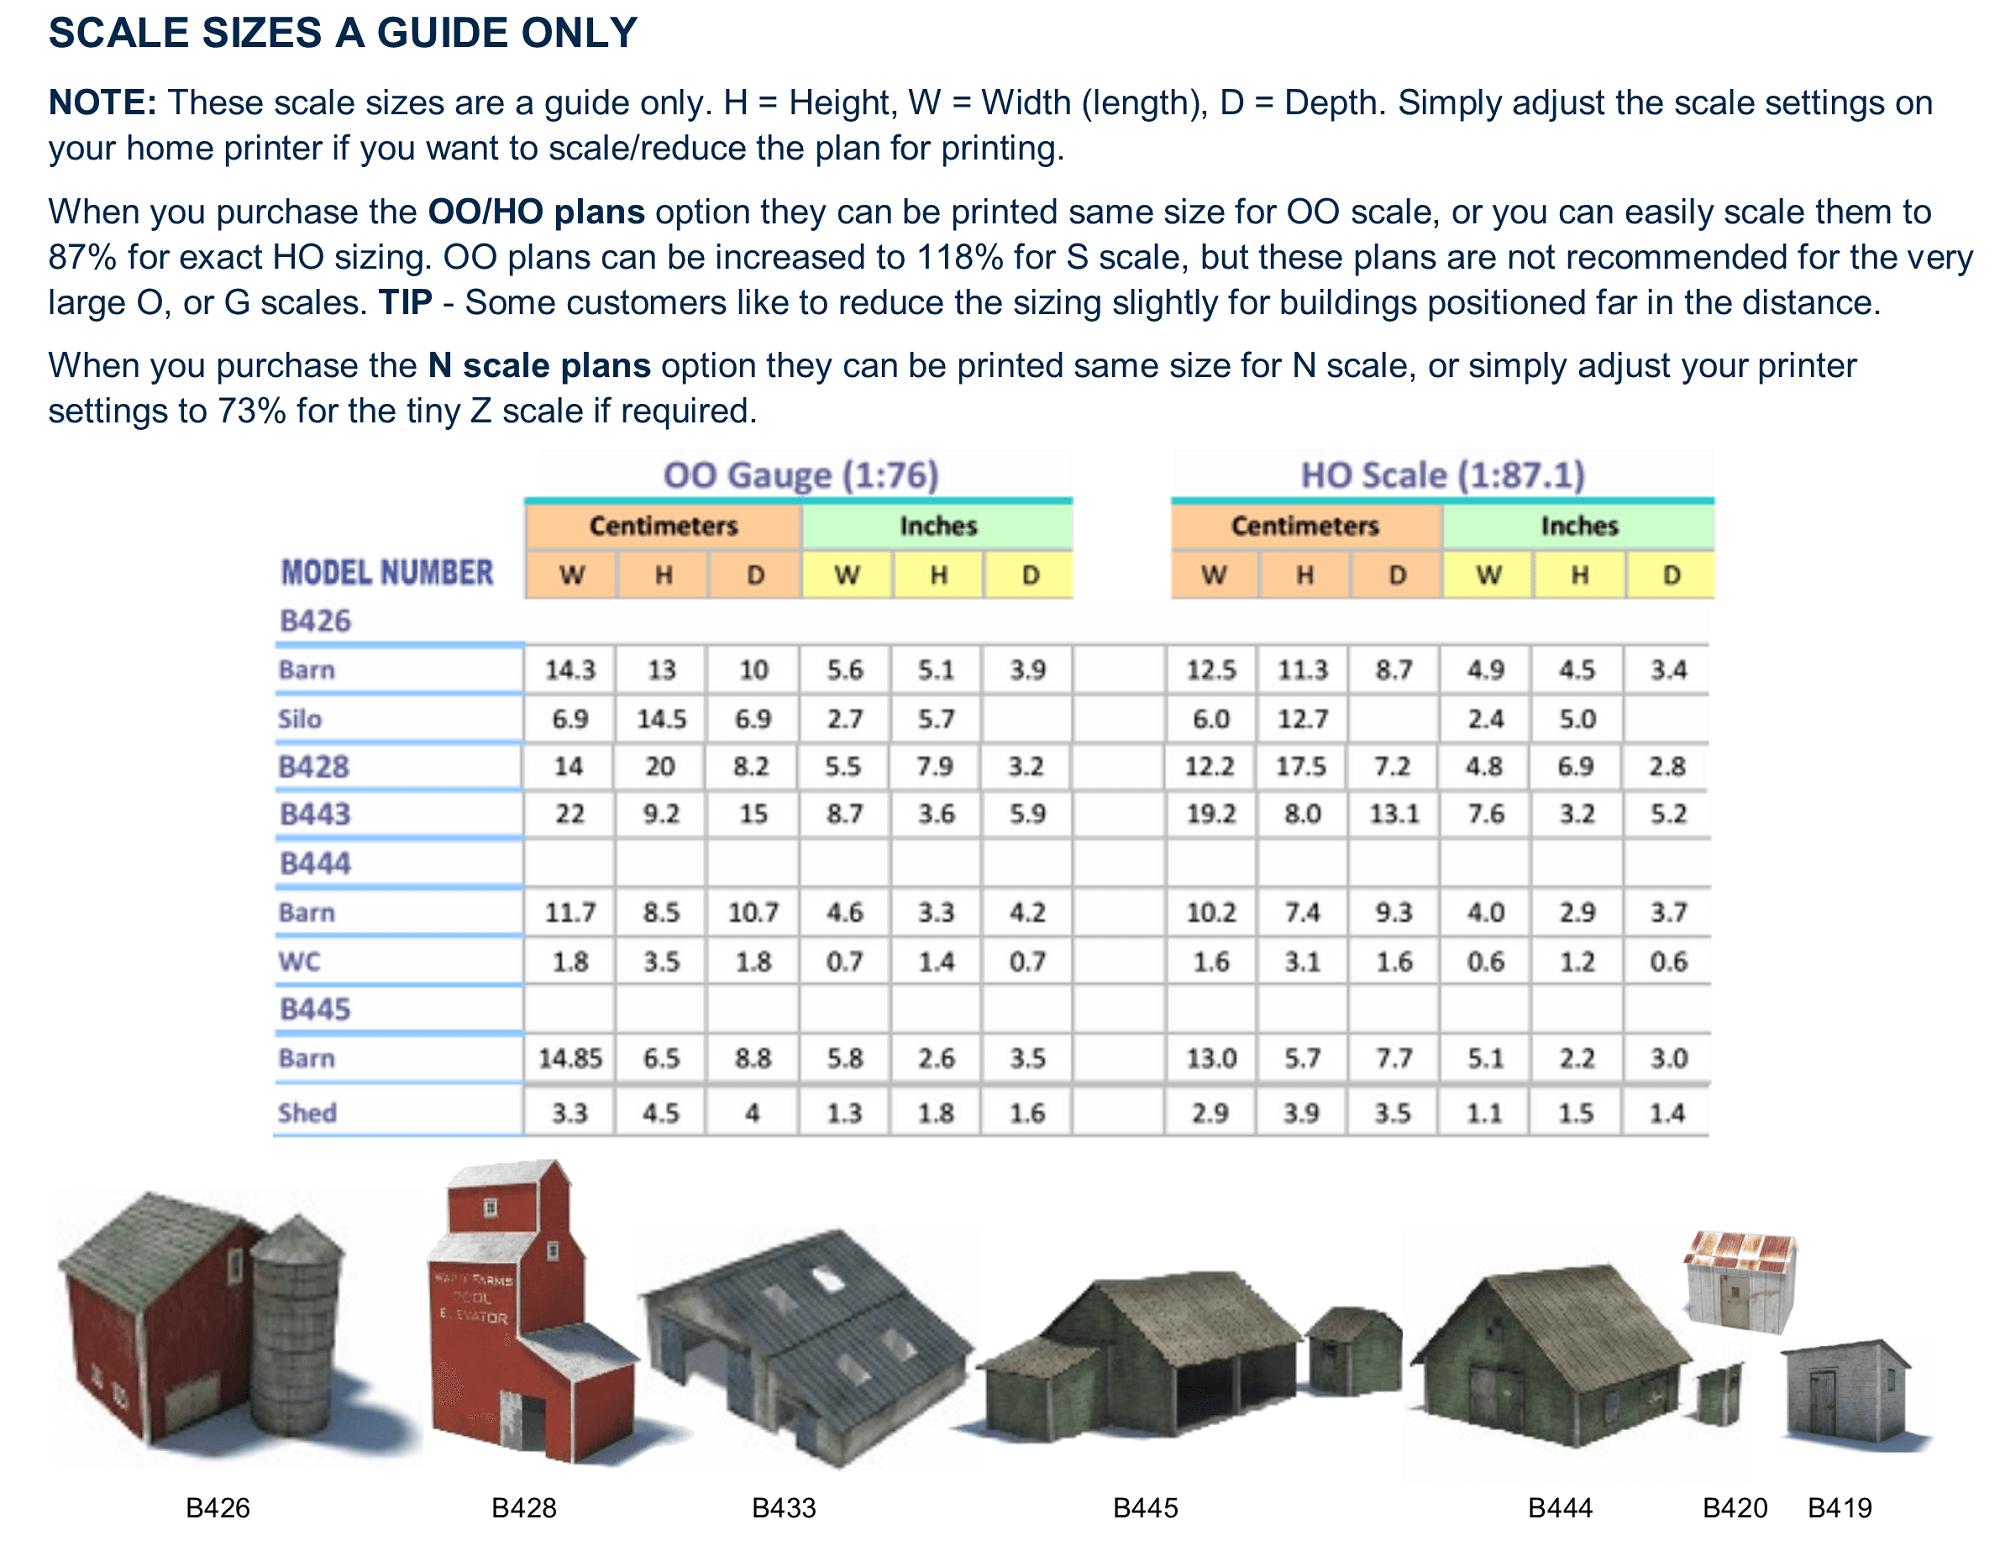 HO N OO size farm scale models